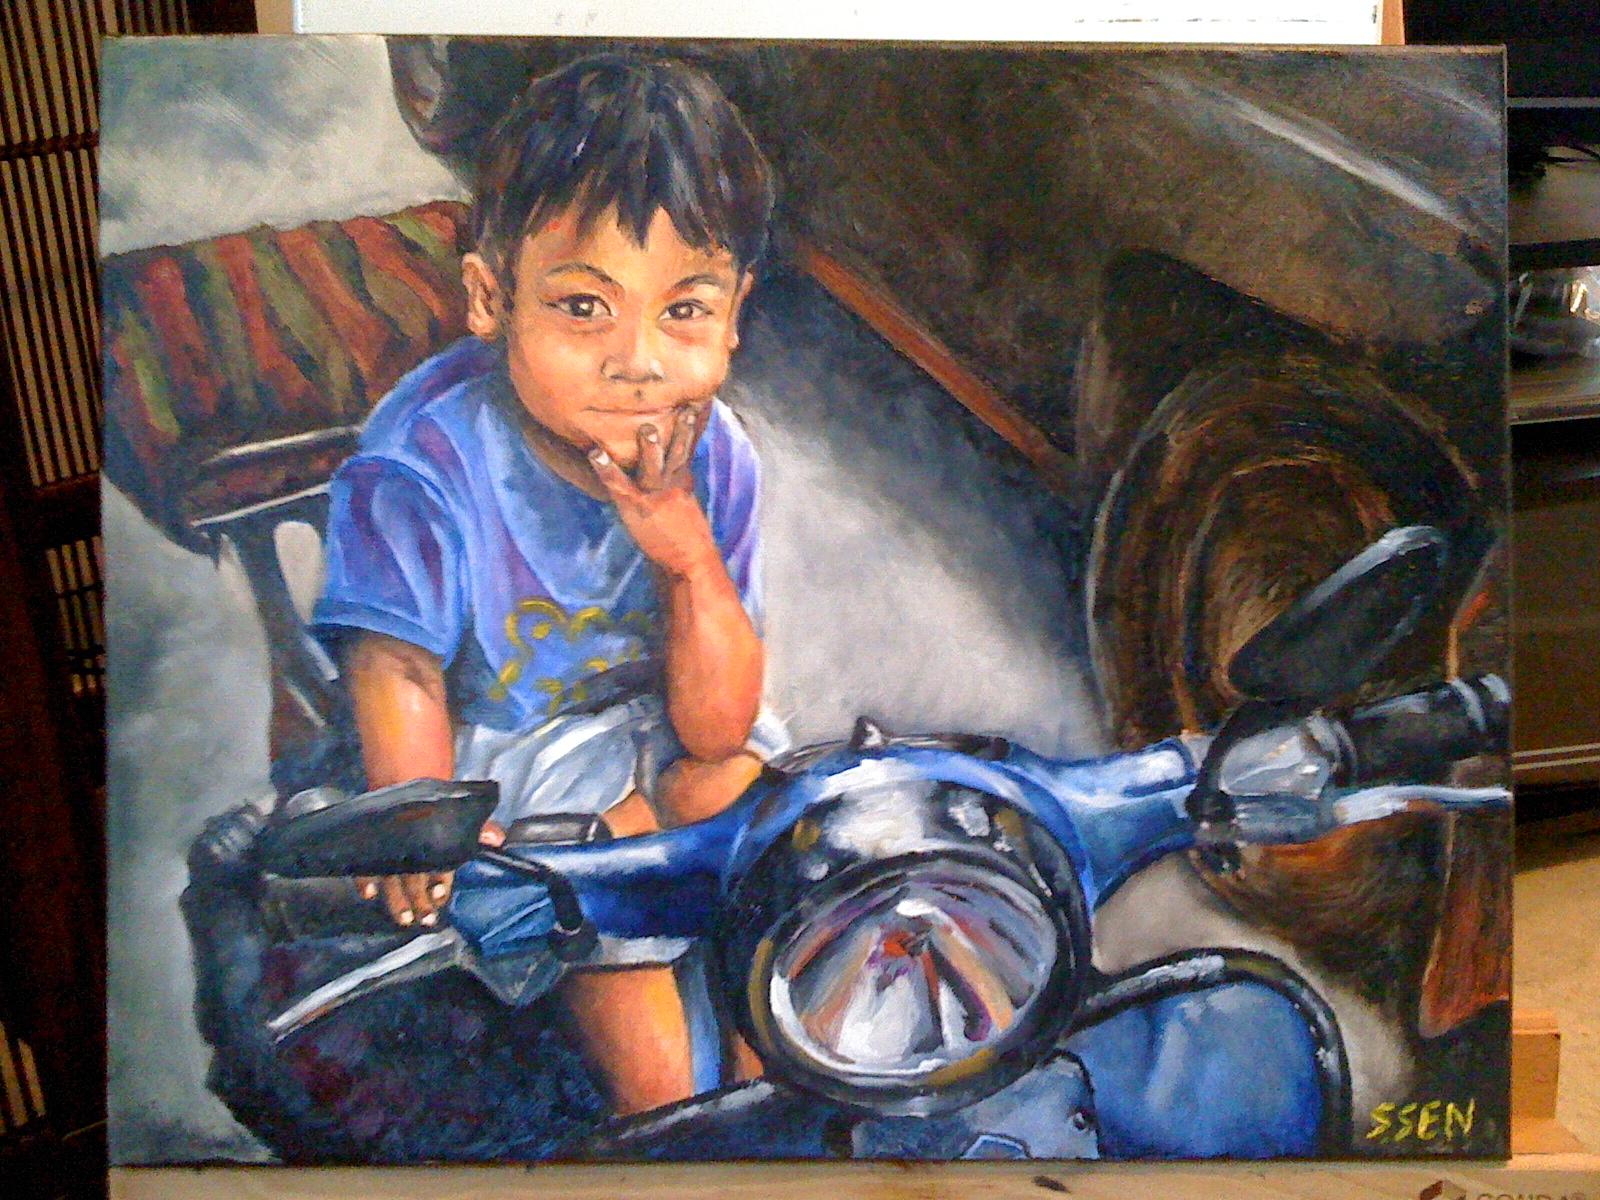 Thai Boy on Scooter